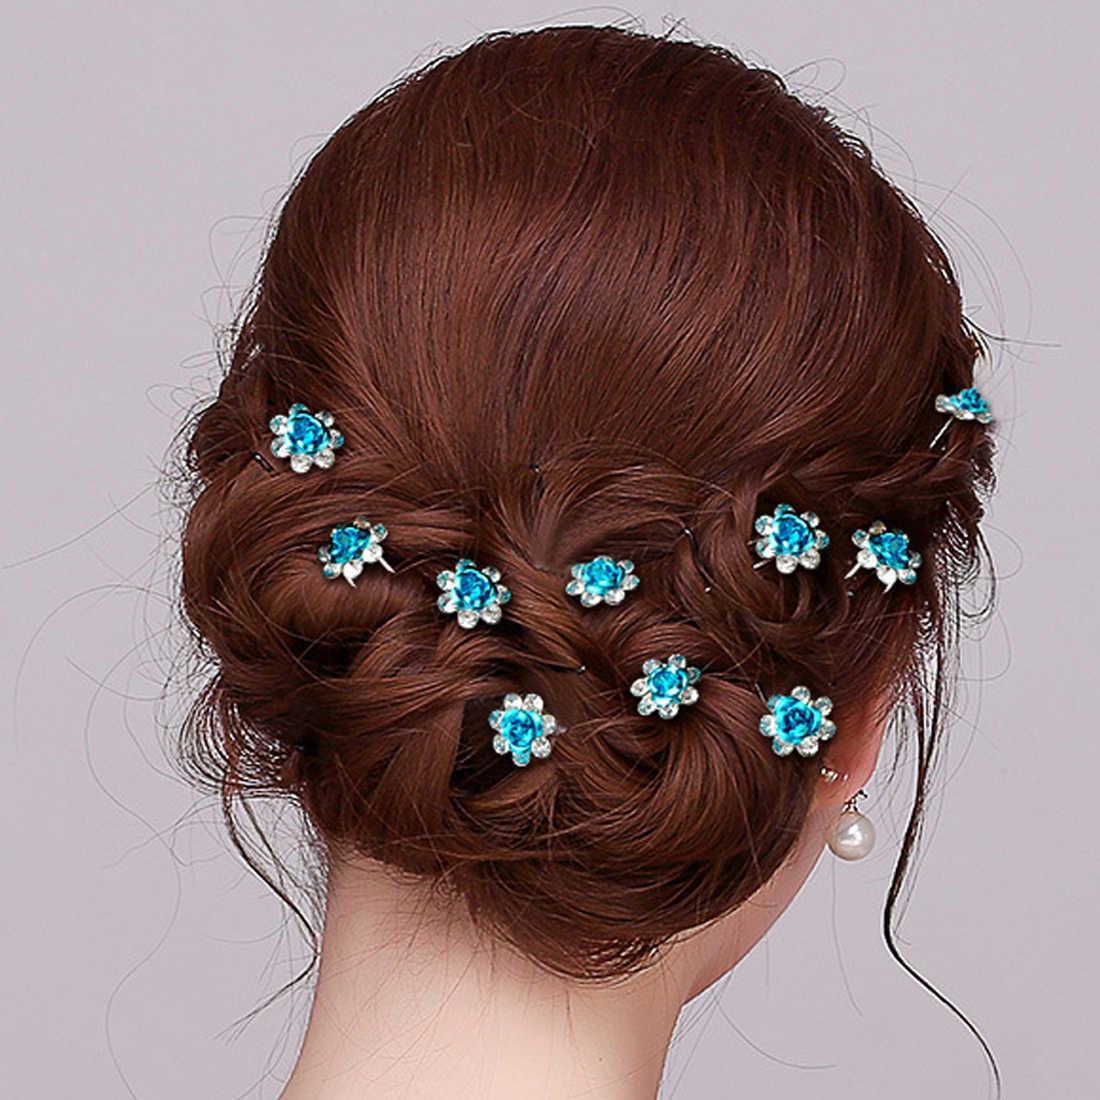 Bunga baru Naik Jepit Rambut Klip 1 Pcs Wanita Bridal Pernikahan Kristal Diamante Barrettes Tongkat Rambut Braider Styling Alat Aksesoris